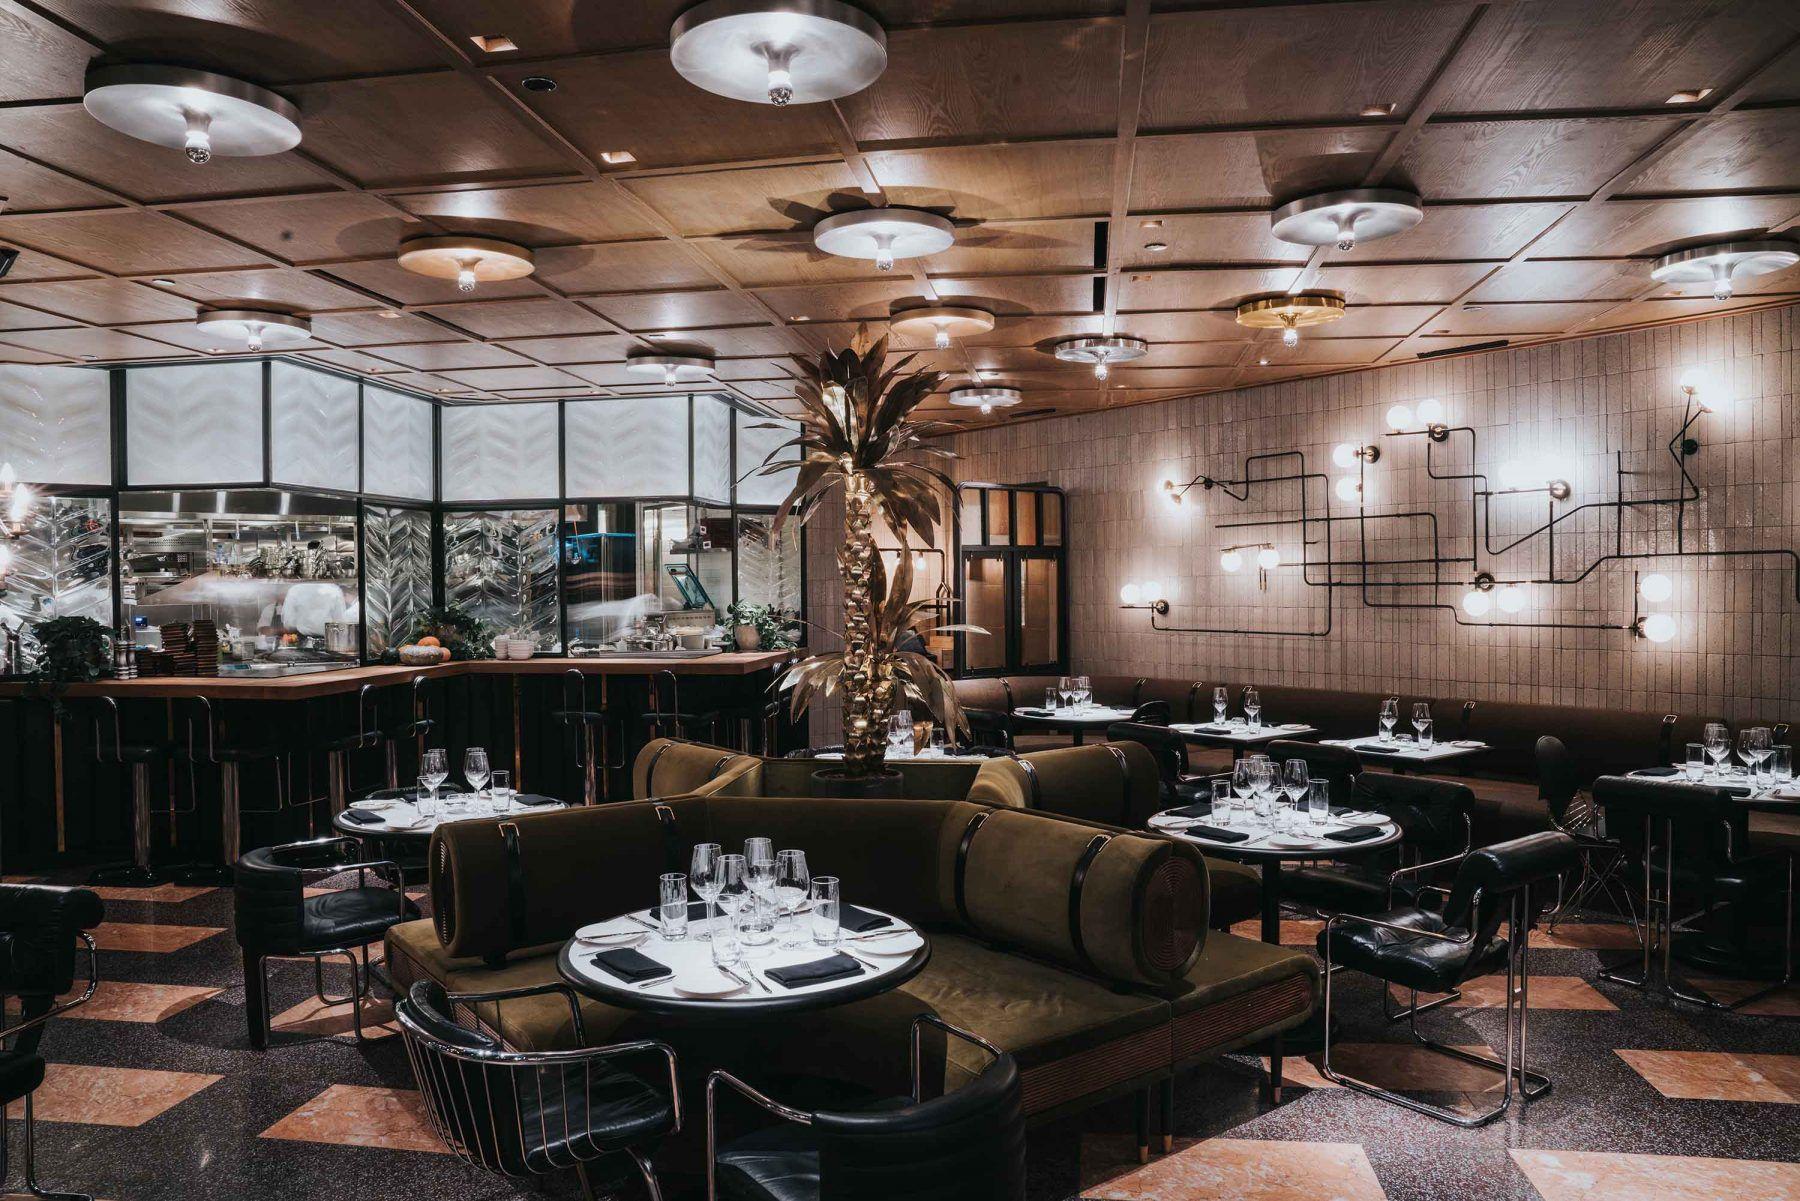 BANQUETTE DETAILING Custom Pinterest Restaurant bar Top